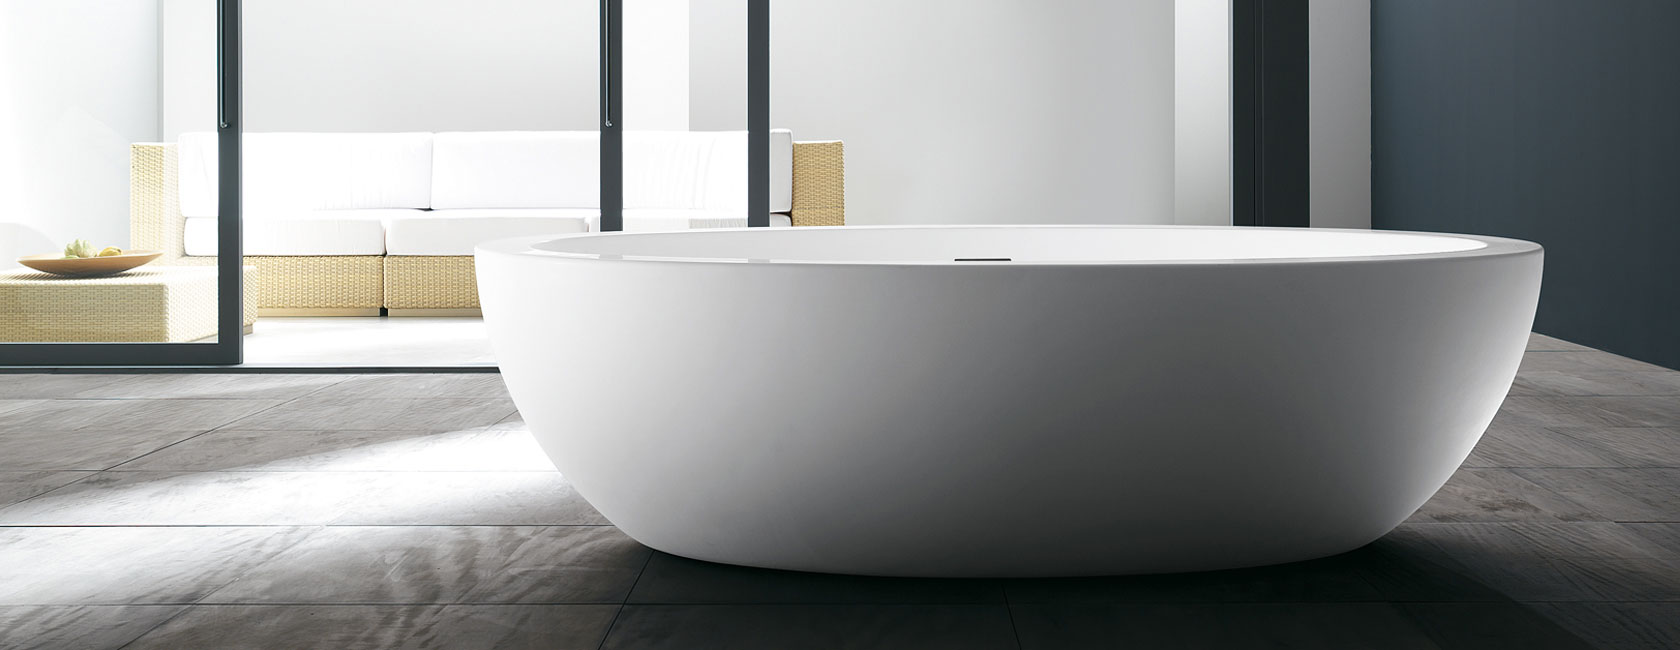 Ba era duralight resina feel teuco sinergia y materiales - Vasche da bagno sovrapposte prezzi ...